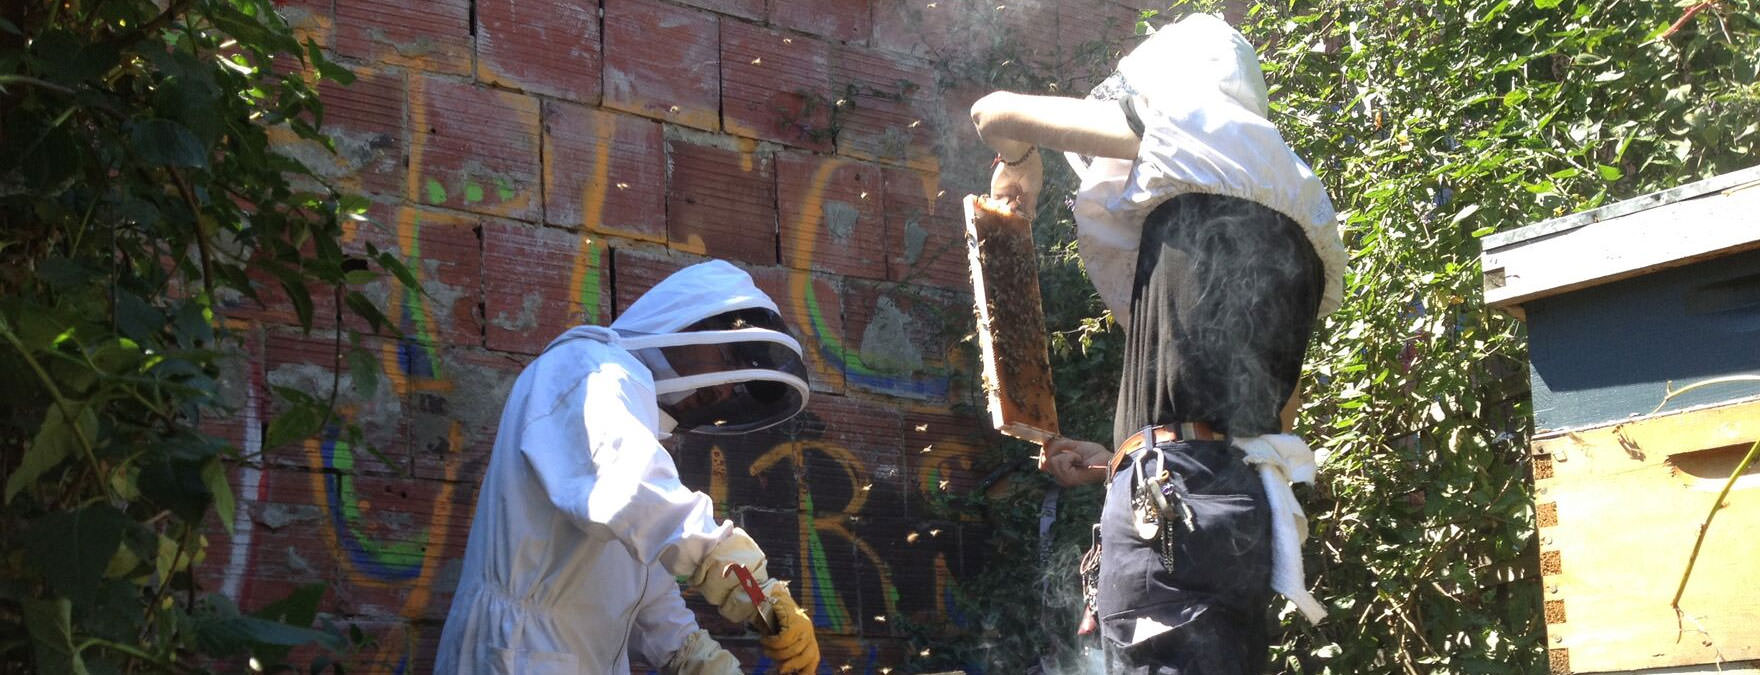 HivesforHumanity_Urban_Beekeeping_THINKblog_resize